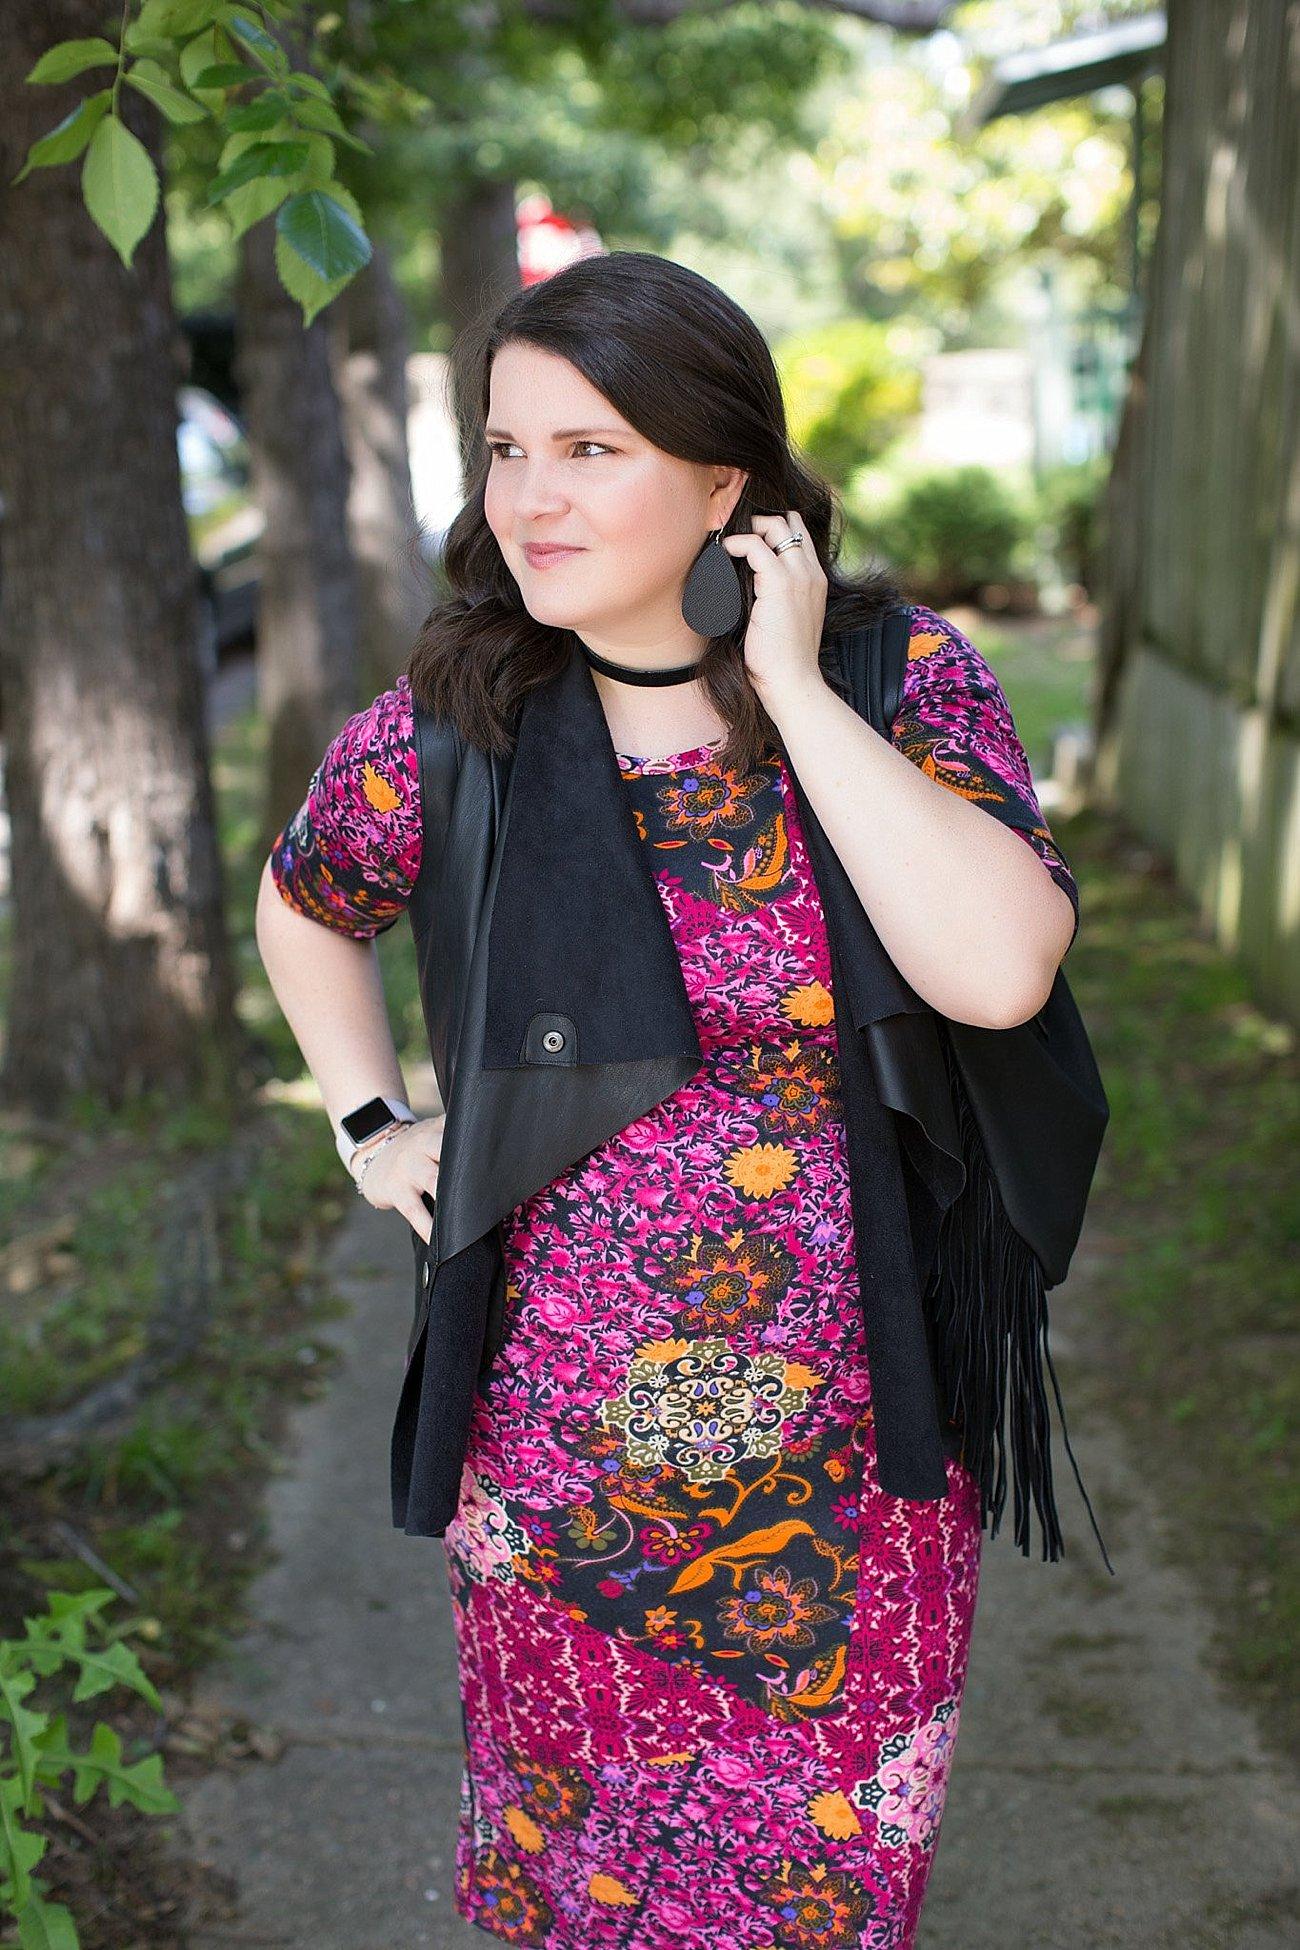 LulaRoe Julia Dress, Stitch Fix Kut From the Kloth Leather Vest, Nickel & Suede Earrings, Nickel & Suede Choker   North Carolina Fashion & Style Blogger (6)